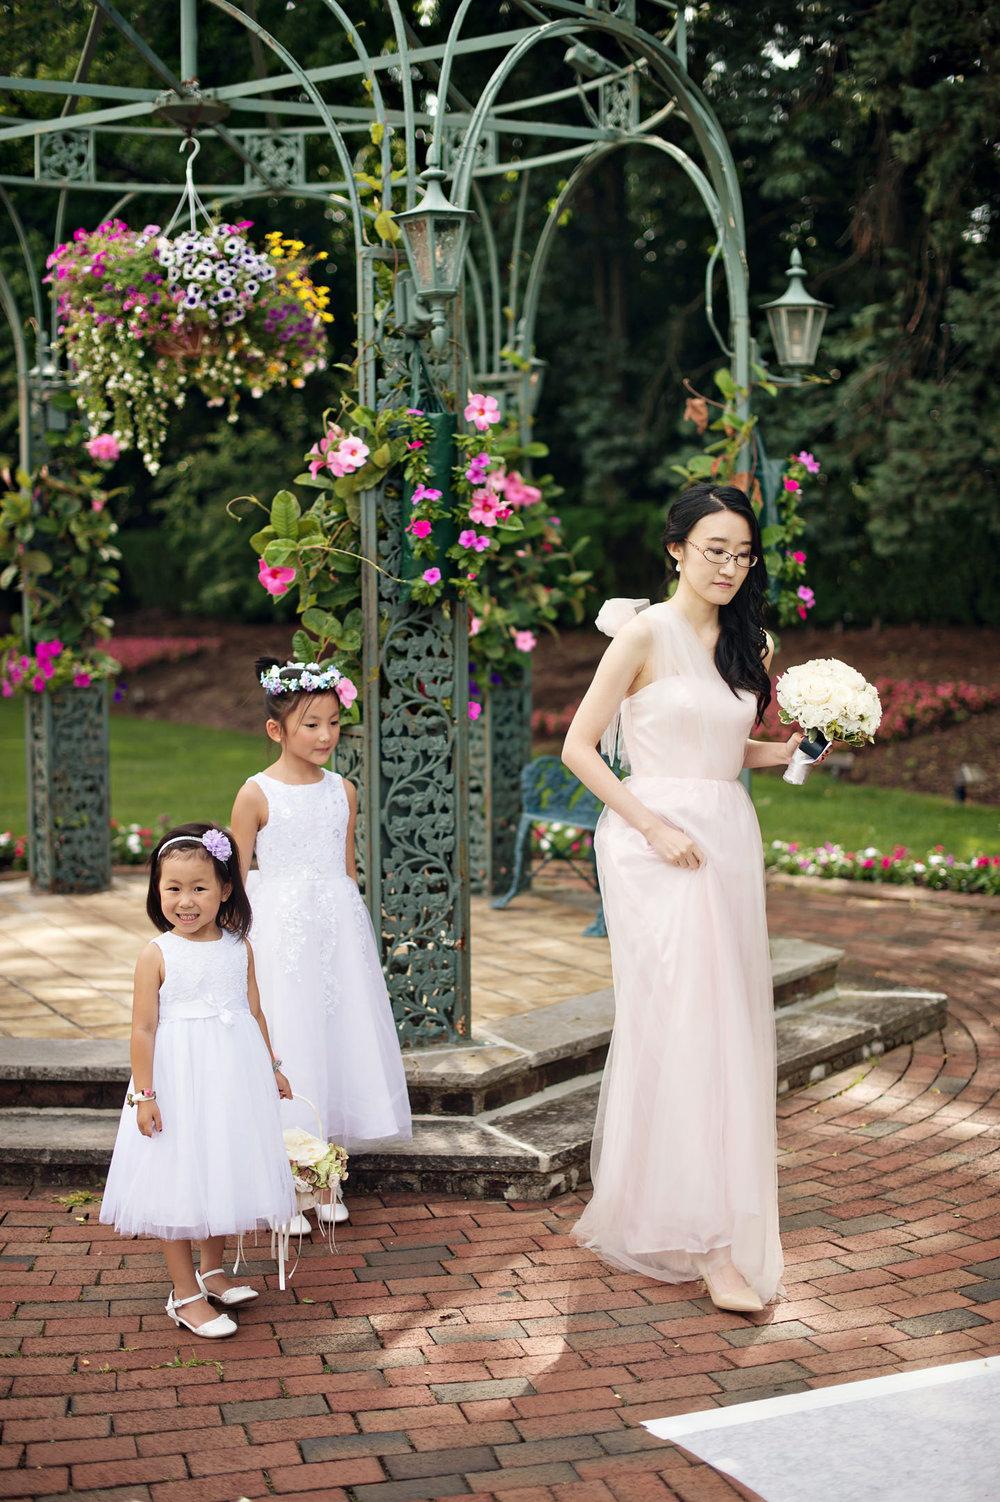 the_Manor-New_Jersey_NJ_Wedding004.JPG